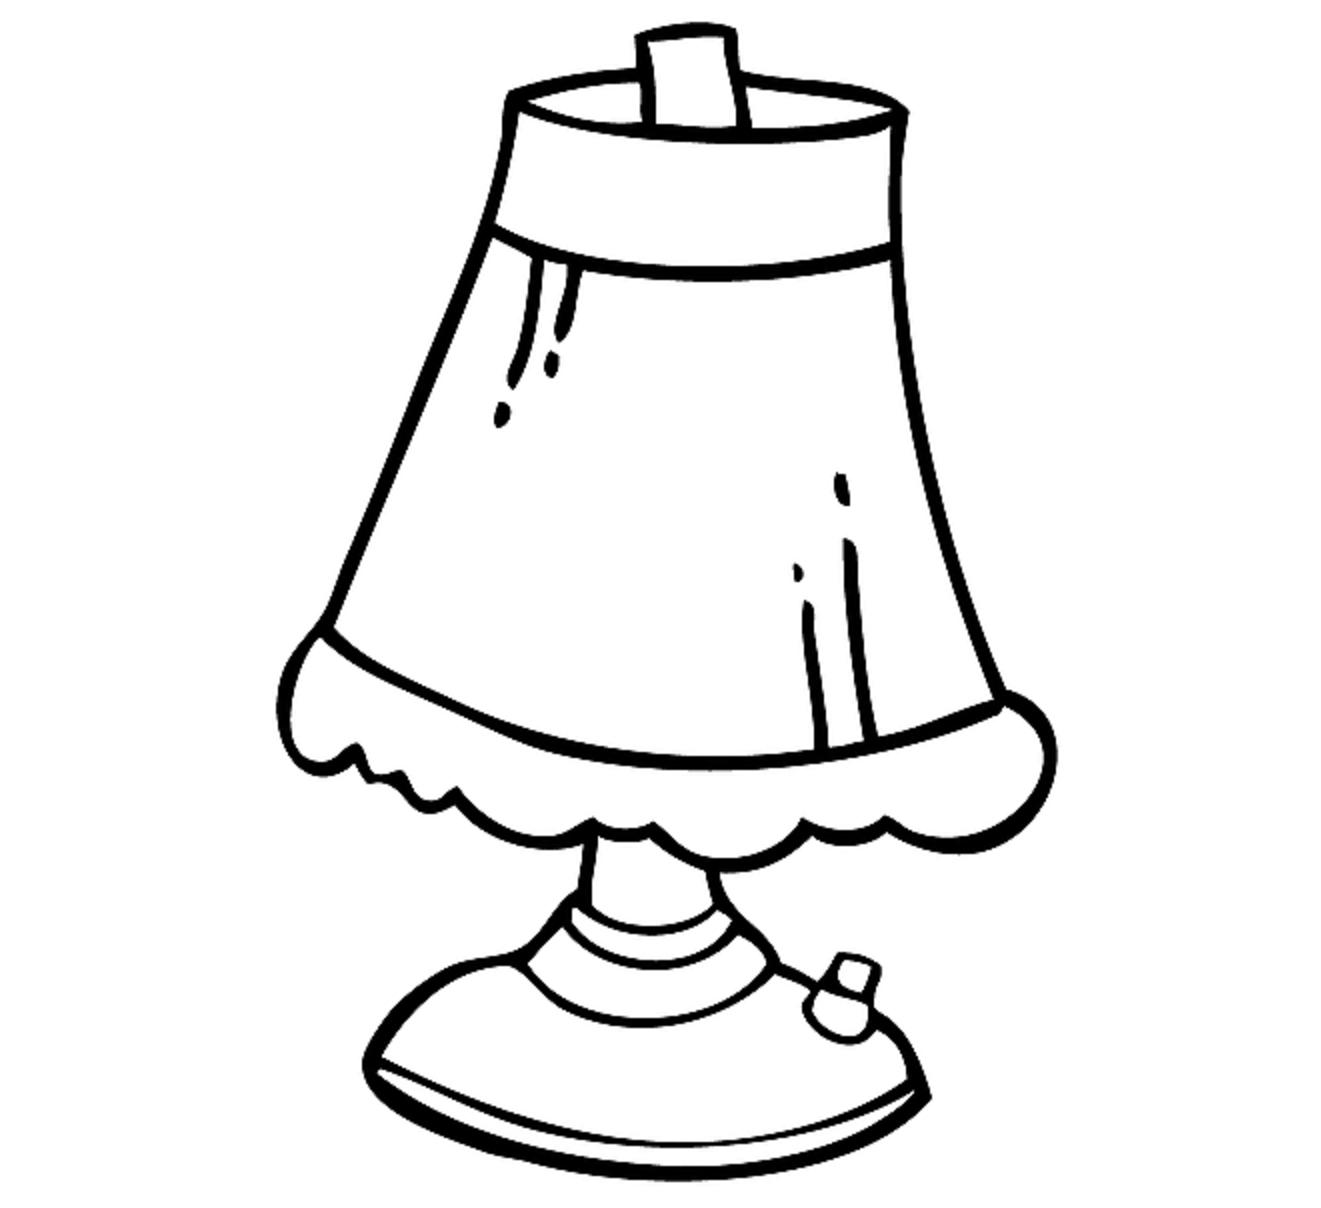 1321x1208 Lamp Drawing Free Download